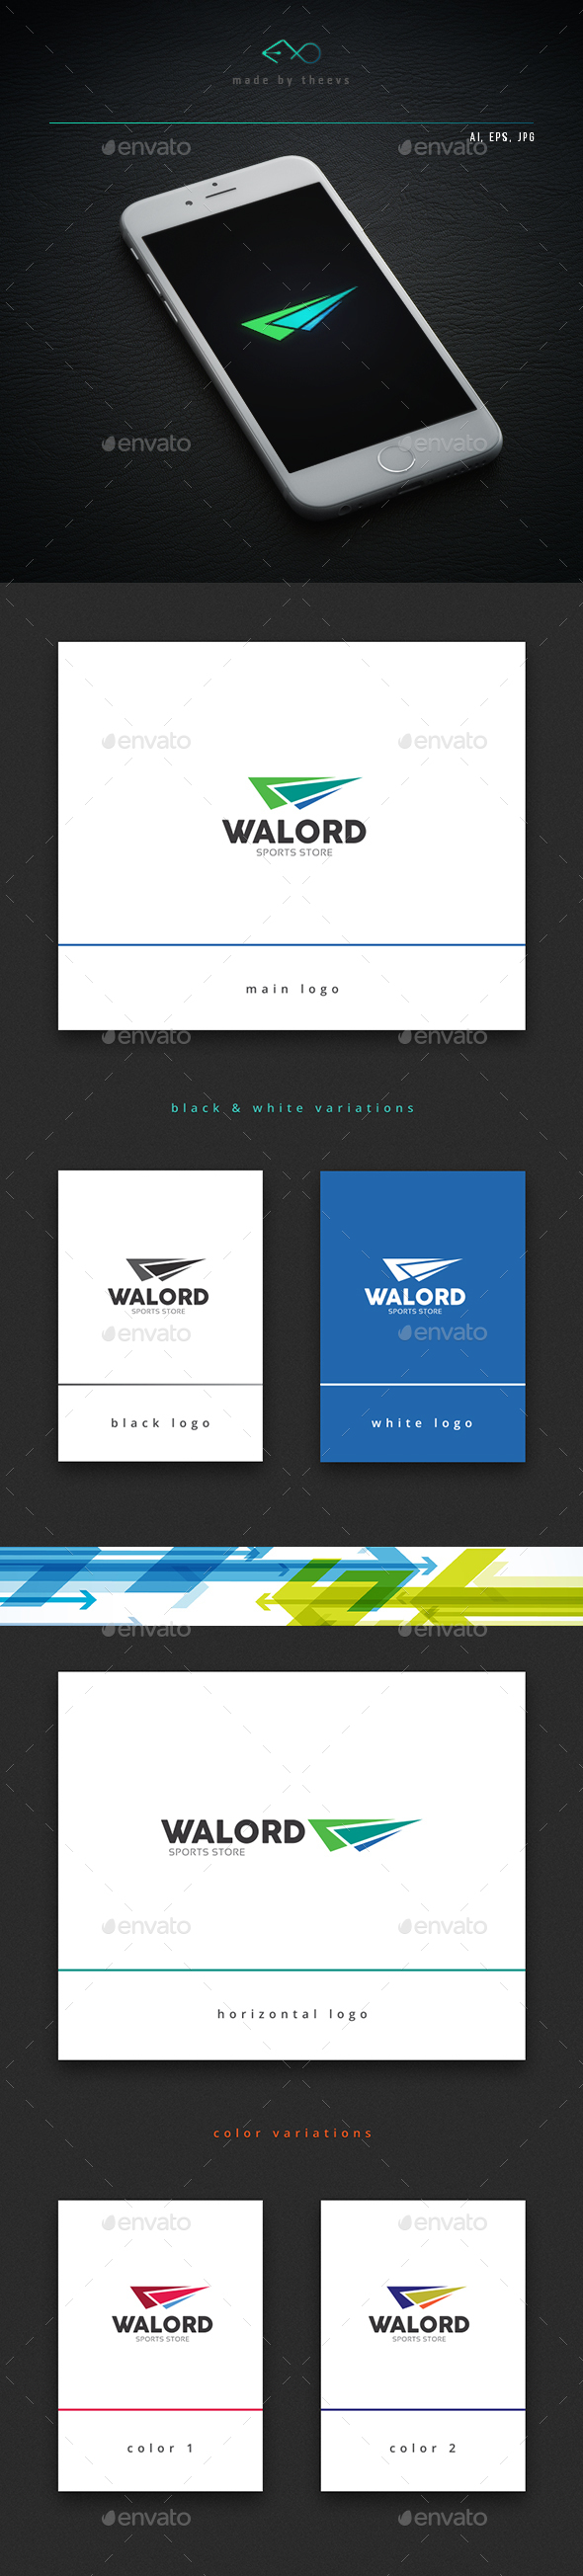 Walord  - Vector Abstract